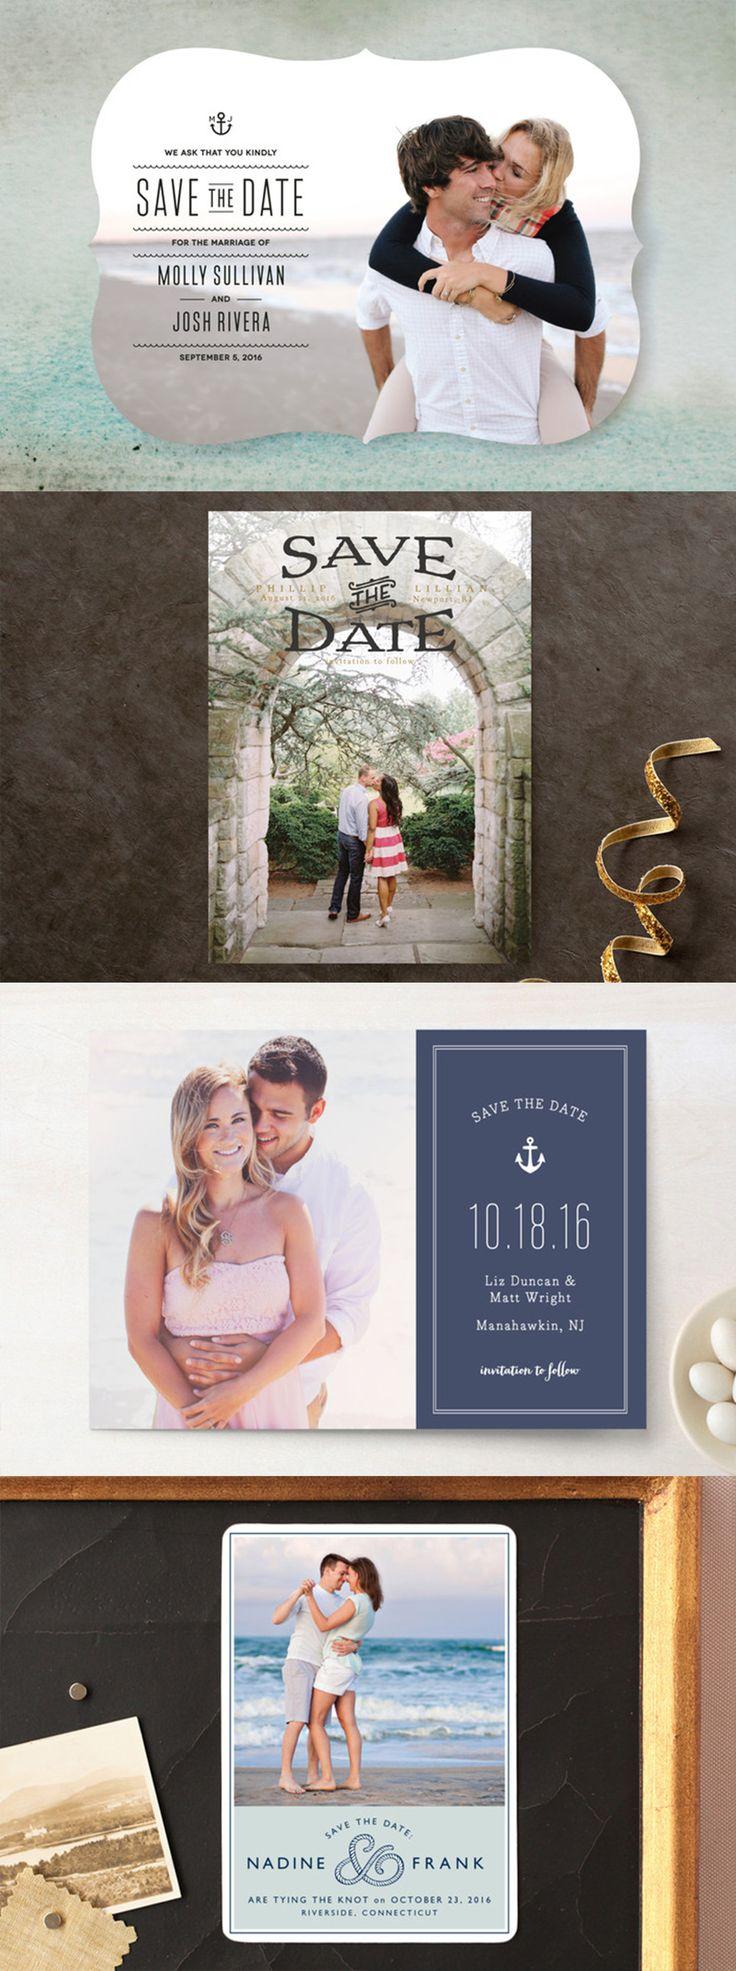 118 Best Nautical Wedding Images On Pinterest Beach Weddings